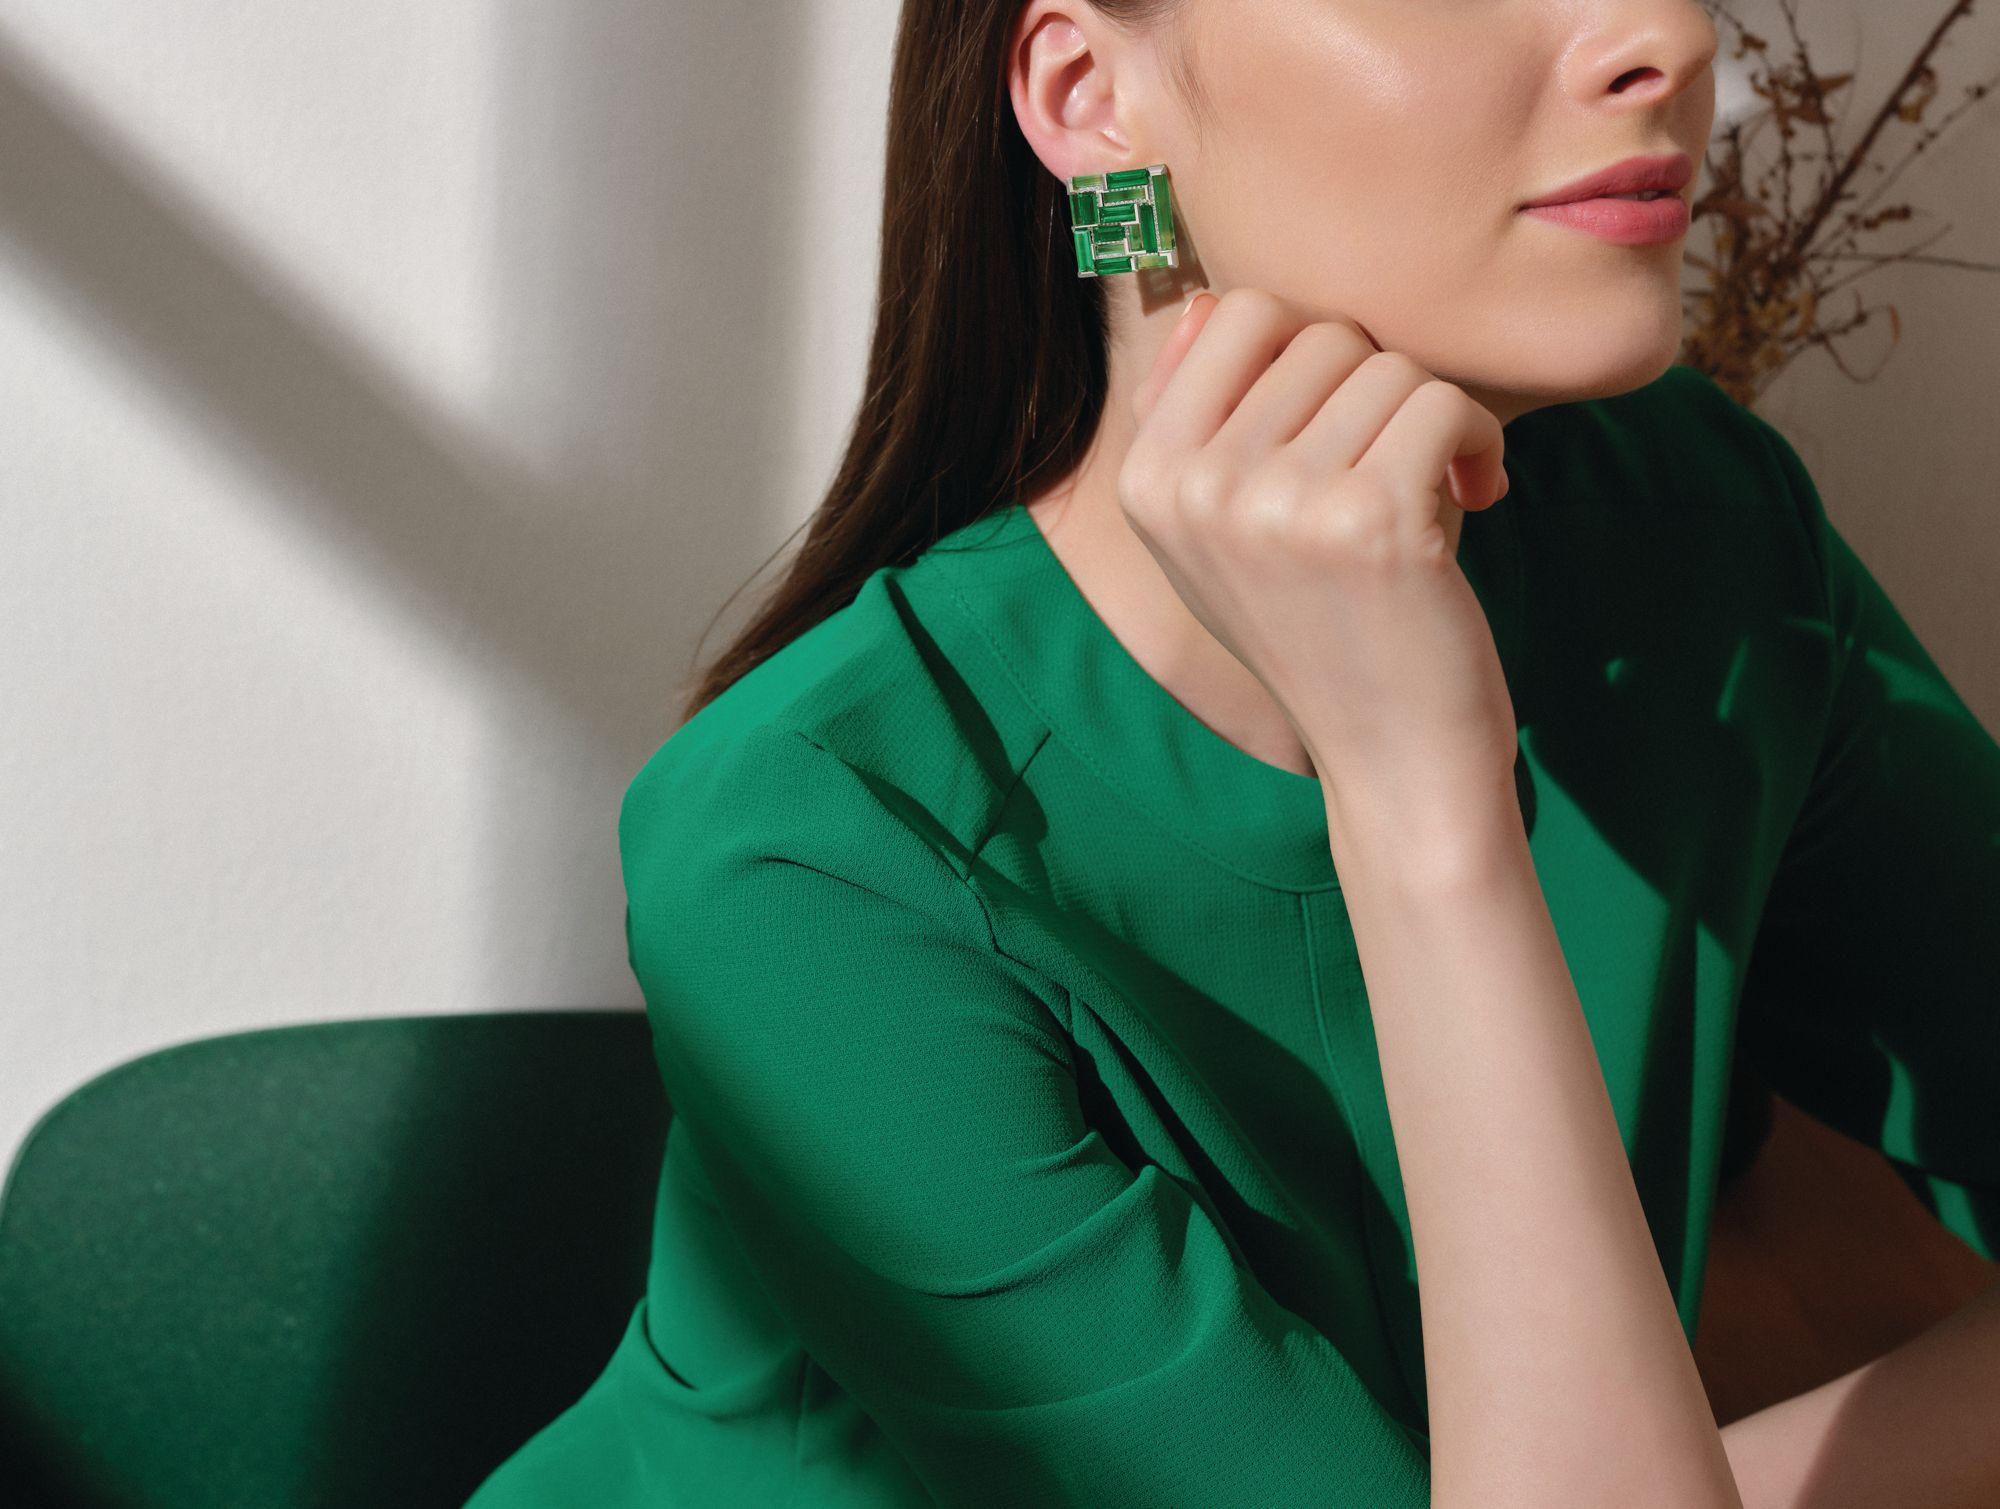 Forms推出鑲有祖母綠和鑽石的白金耳環。 (Photo: Courtesy of Forms)